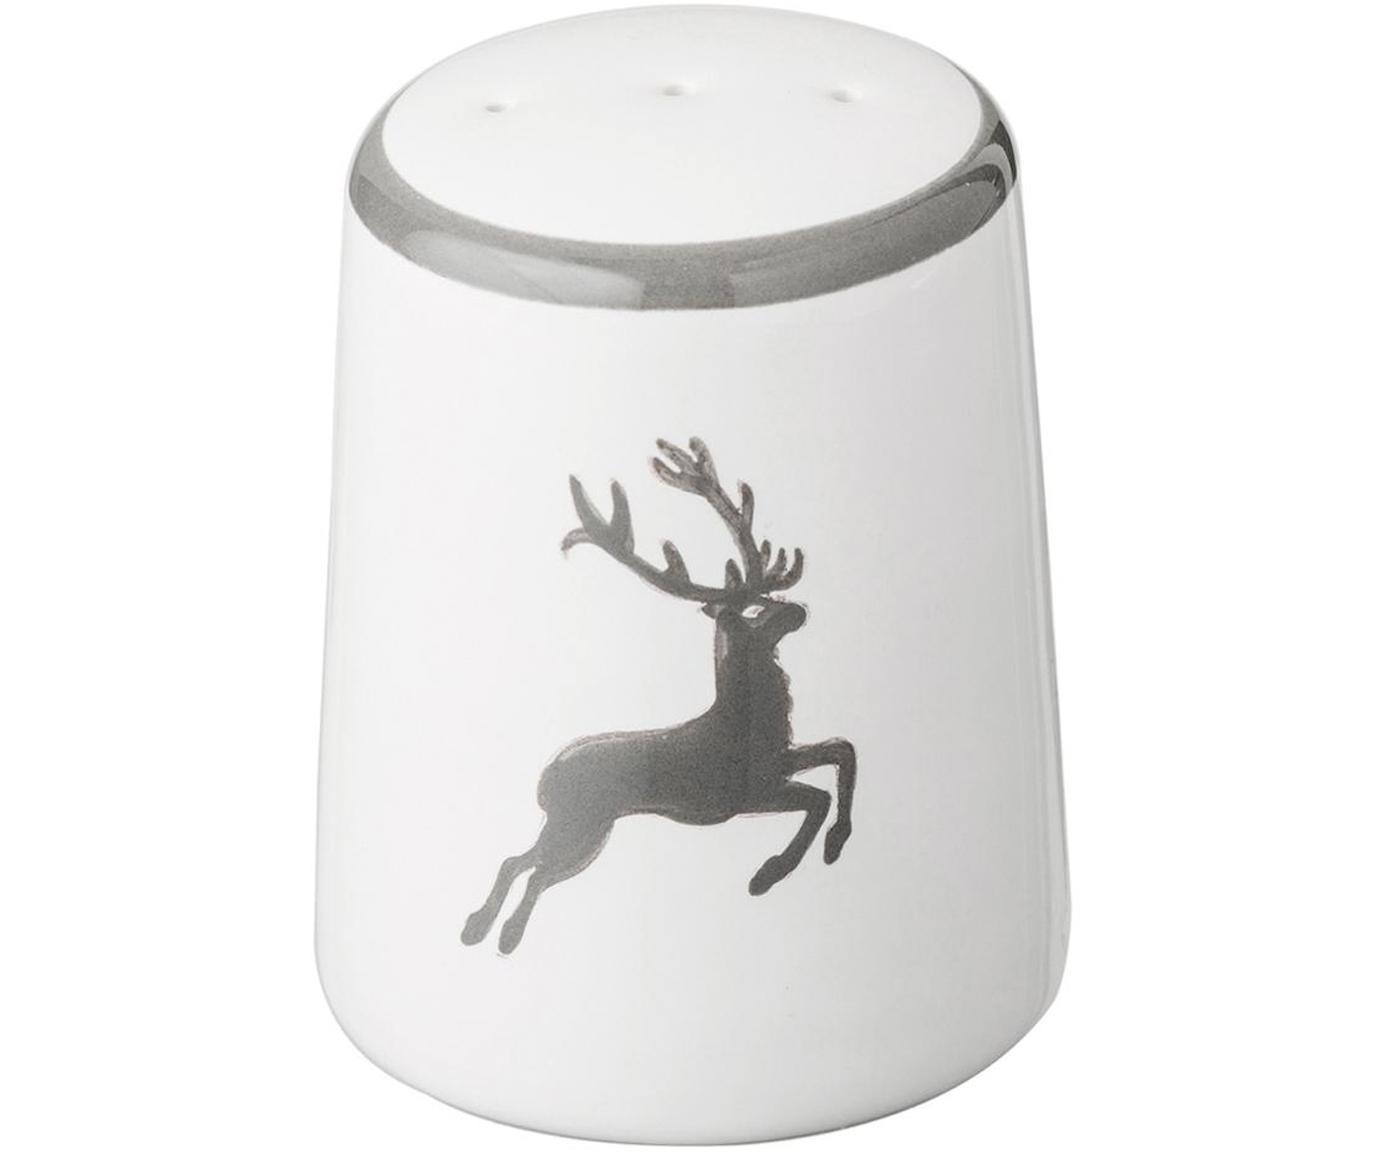 Pepiera con cervo Classic, Ceramica, Grigio, bianco, 4 x 6 cm